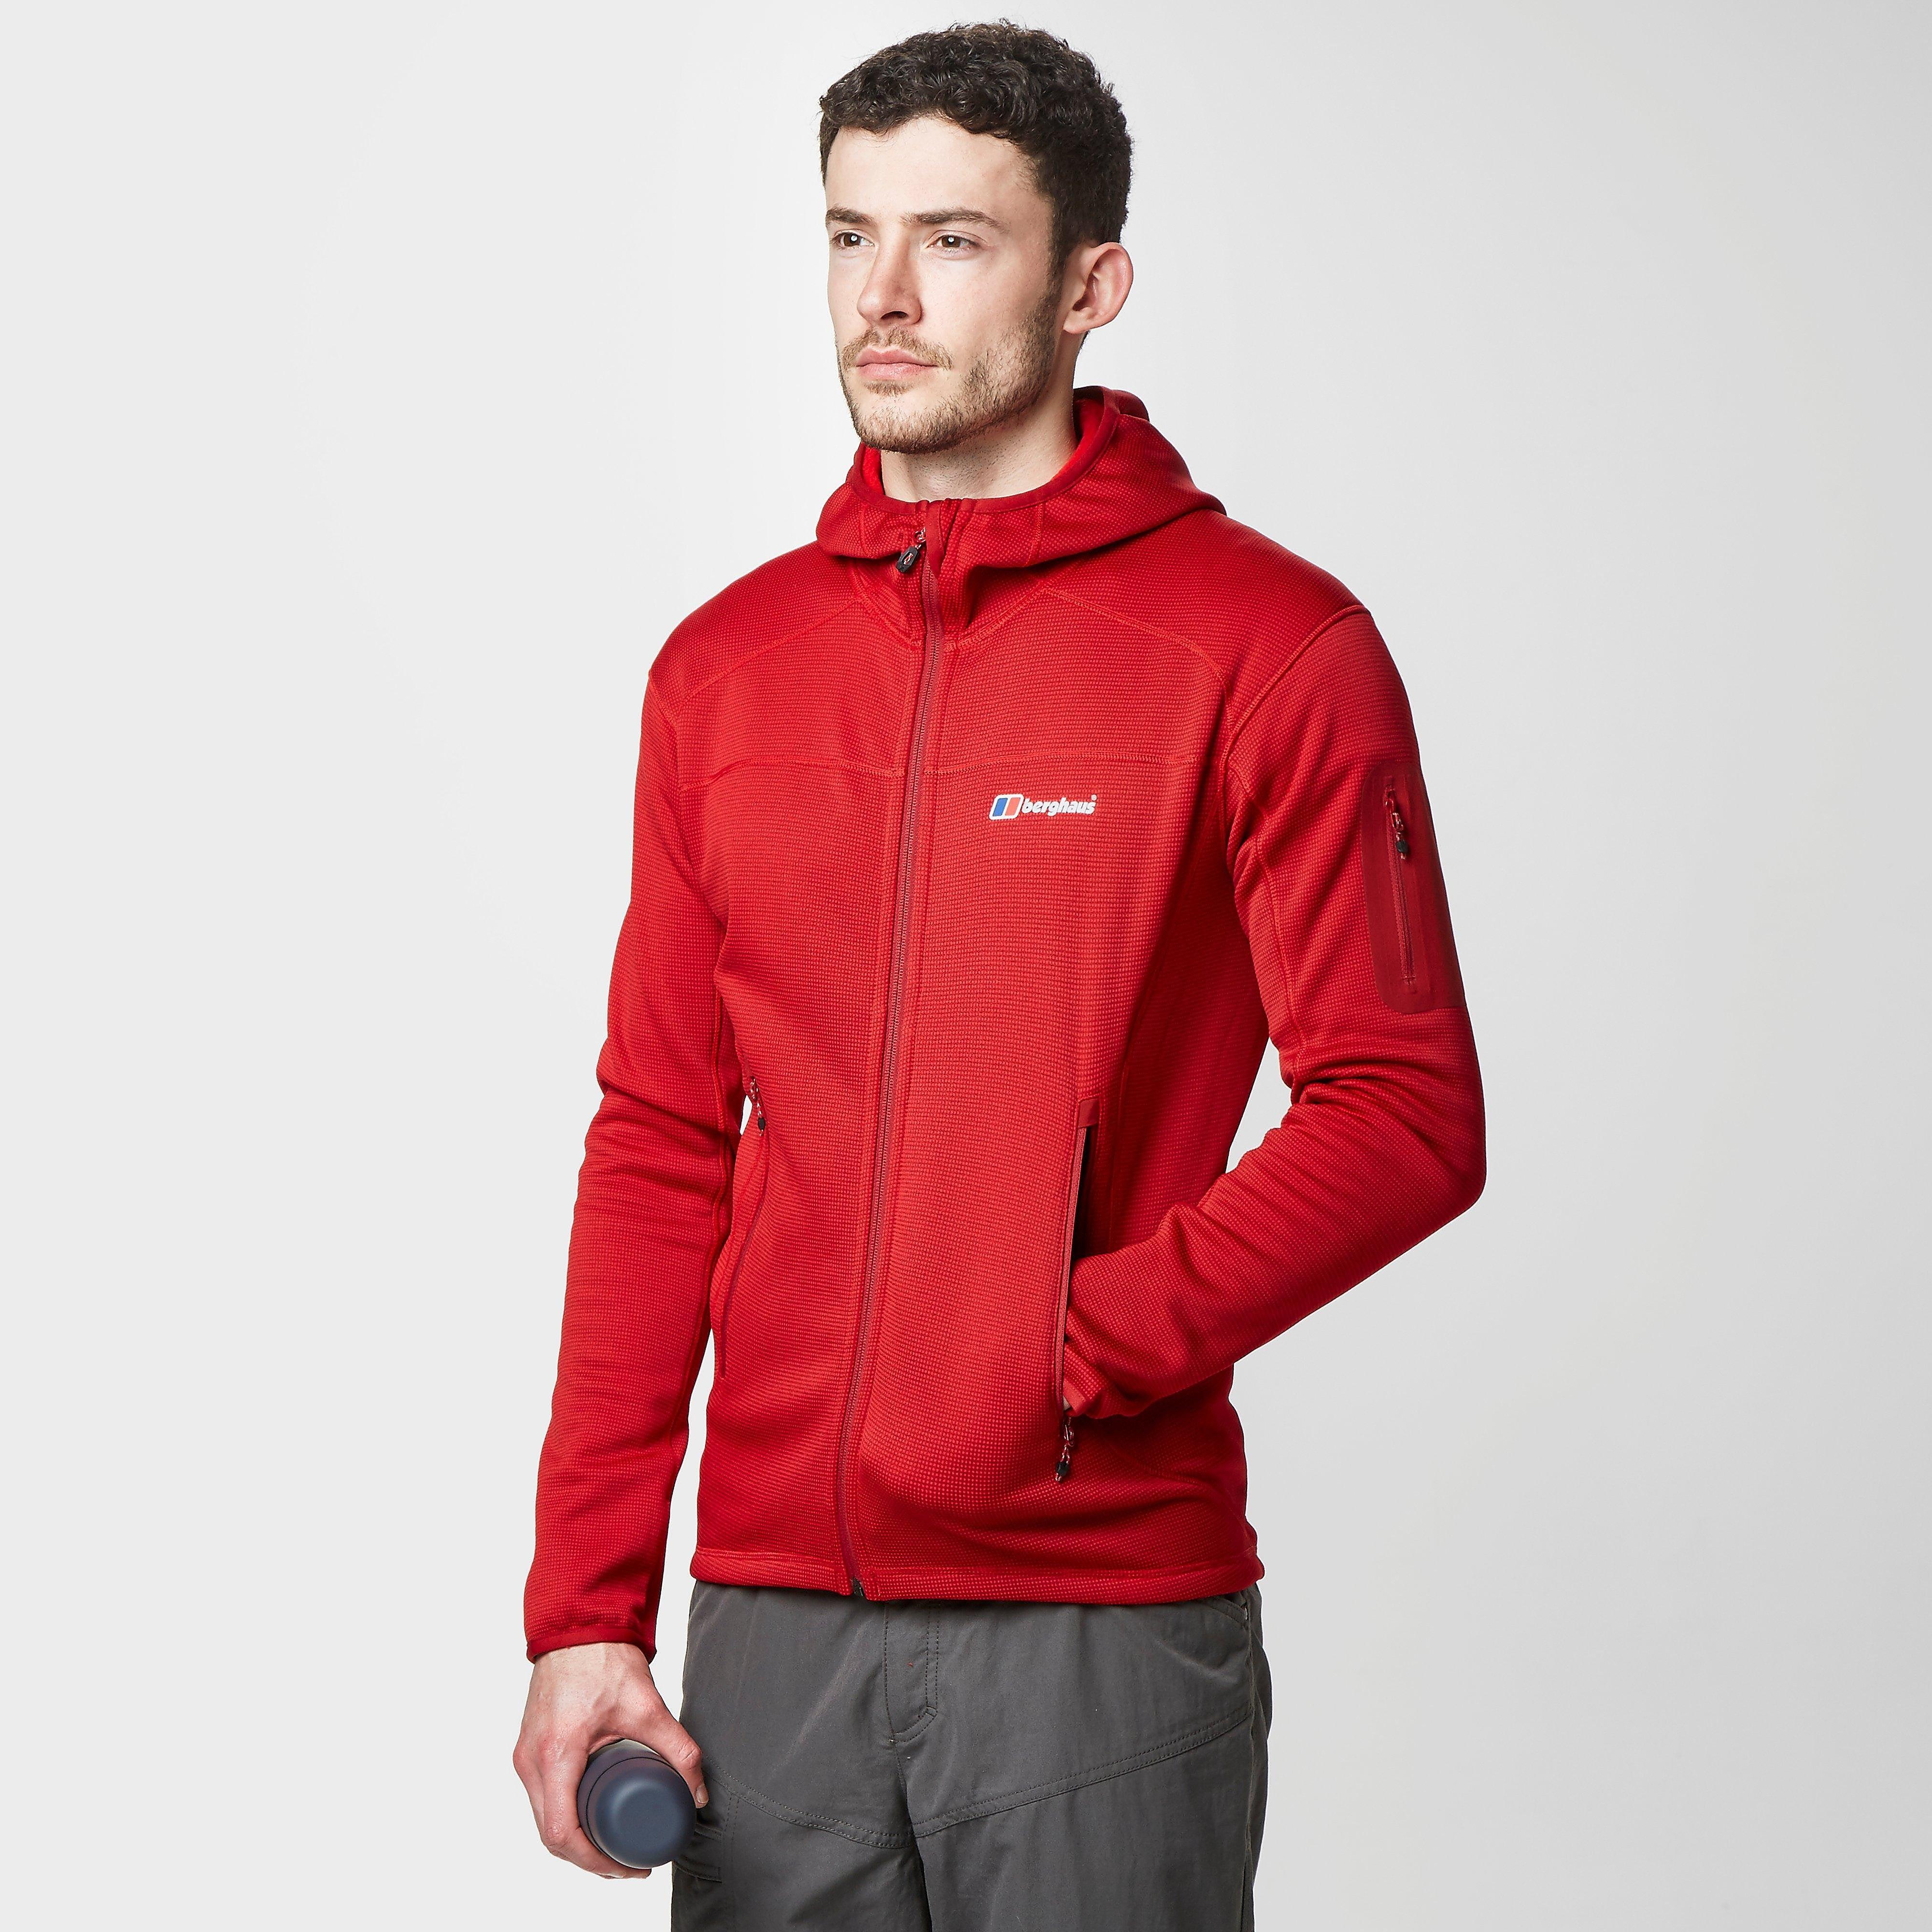 Berghaus Pravitale 2.0 Extrem Hooded Jacket